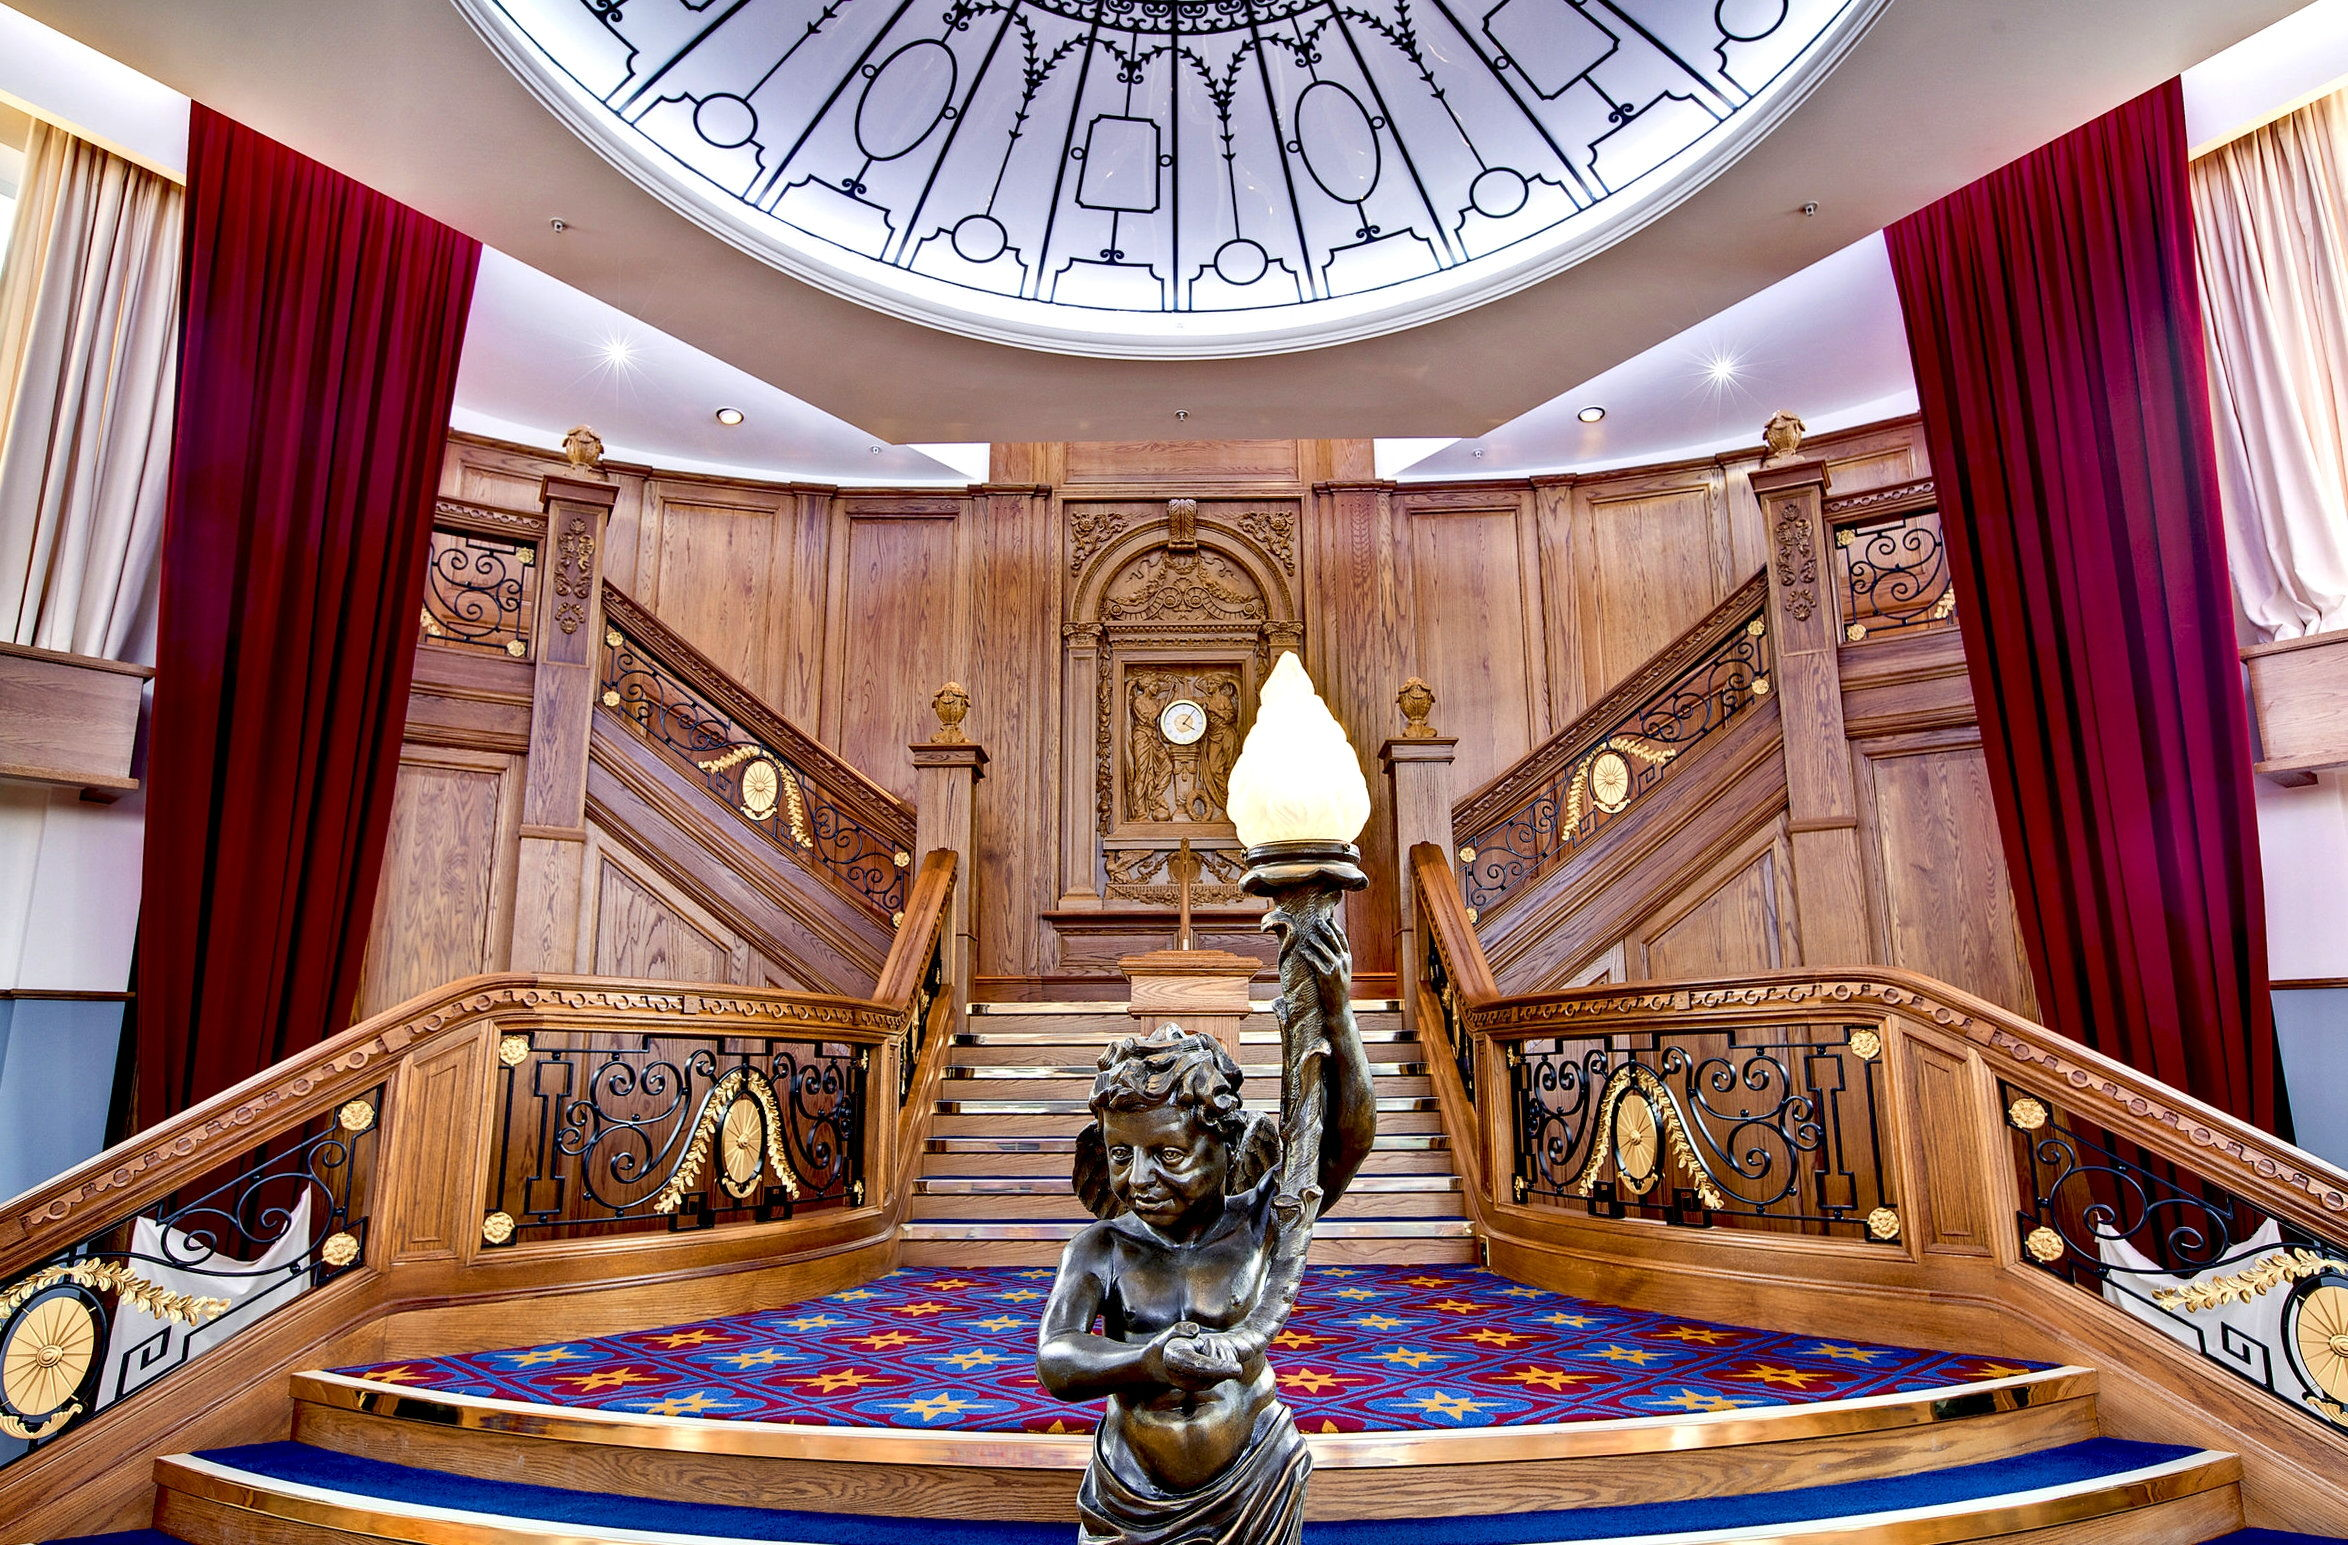 El belfast titanic resucita al m tico barco 100 a os for Oficina de turismo de irlanda